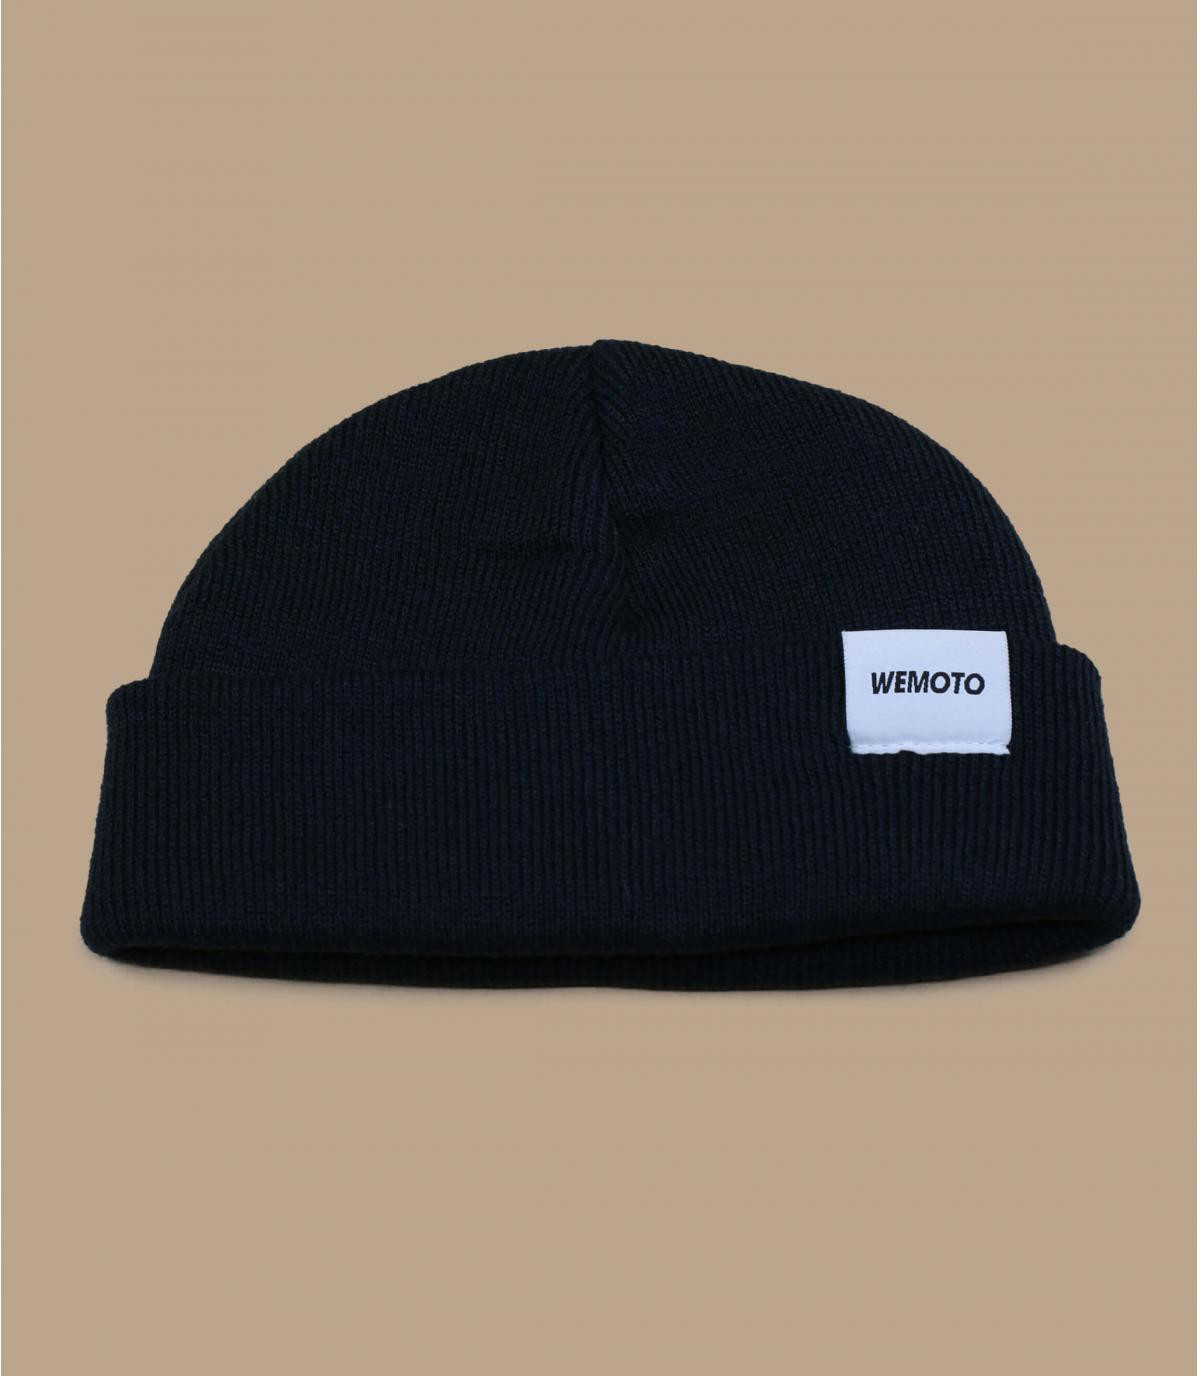 bonnet docker bleu marine Wemoto